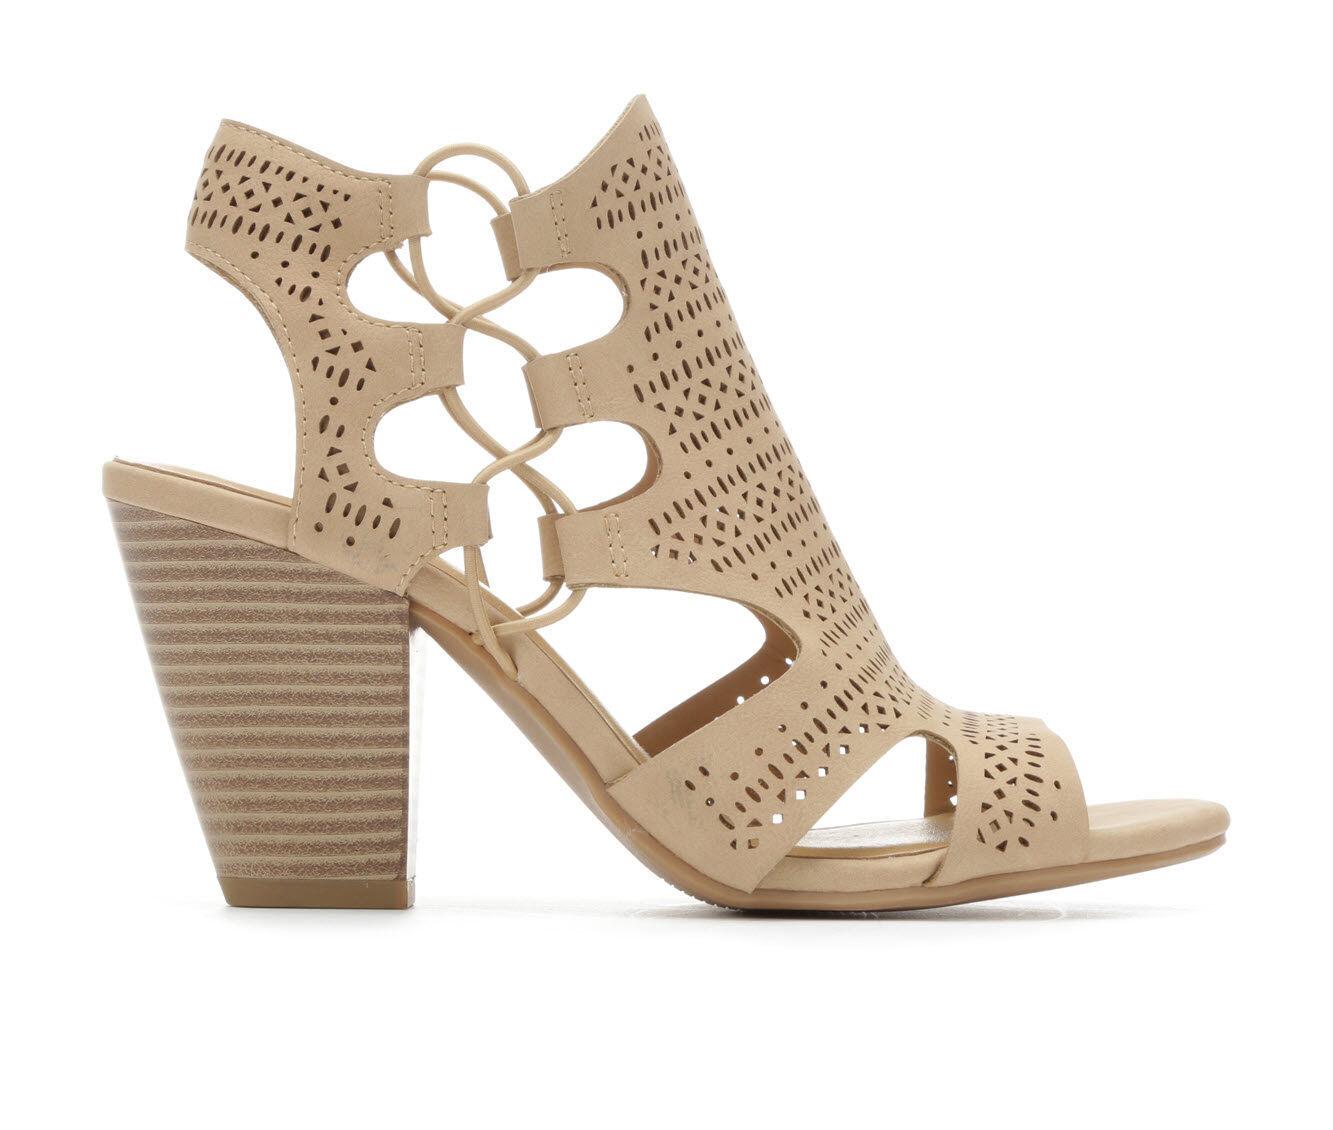 uk shoes_kd3107